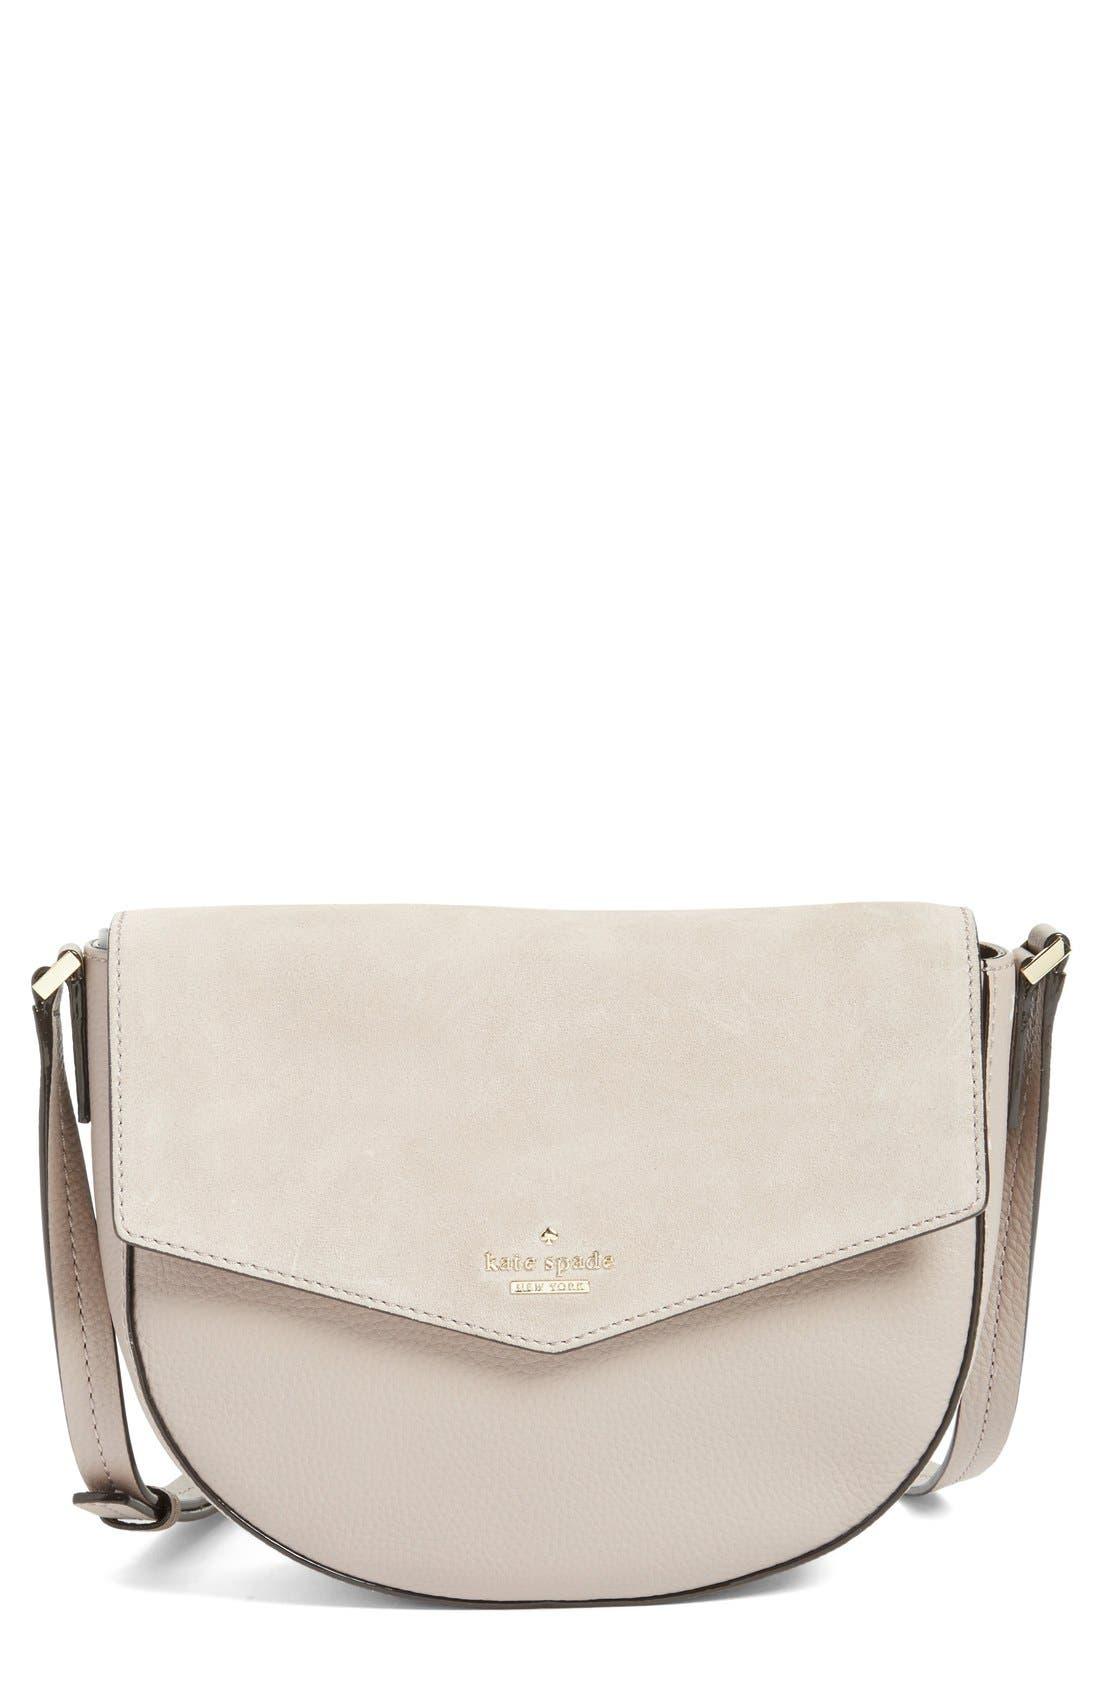 Alternate Image 1 Selected - kate spade new york 'spencer court - lavinia' leather & suede crossbody bag